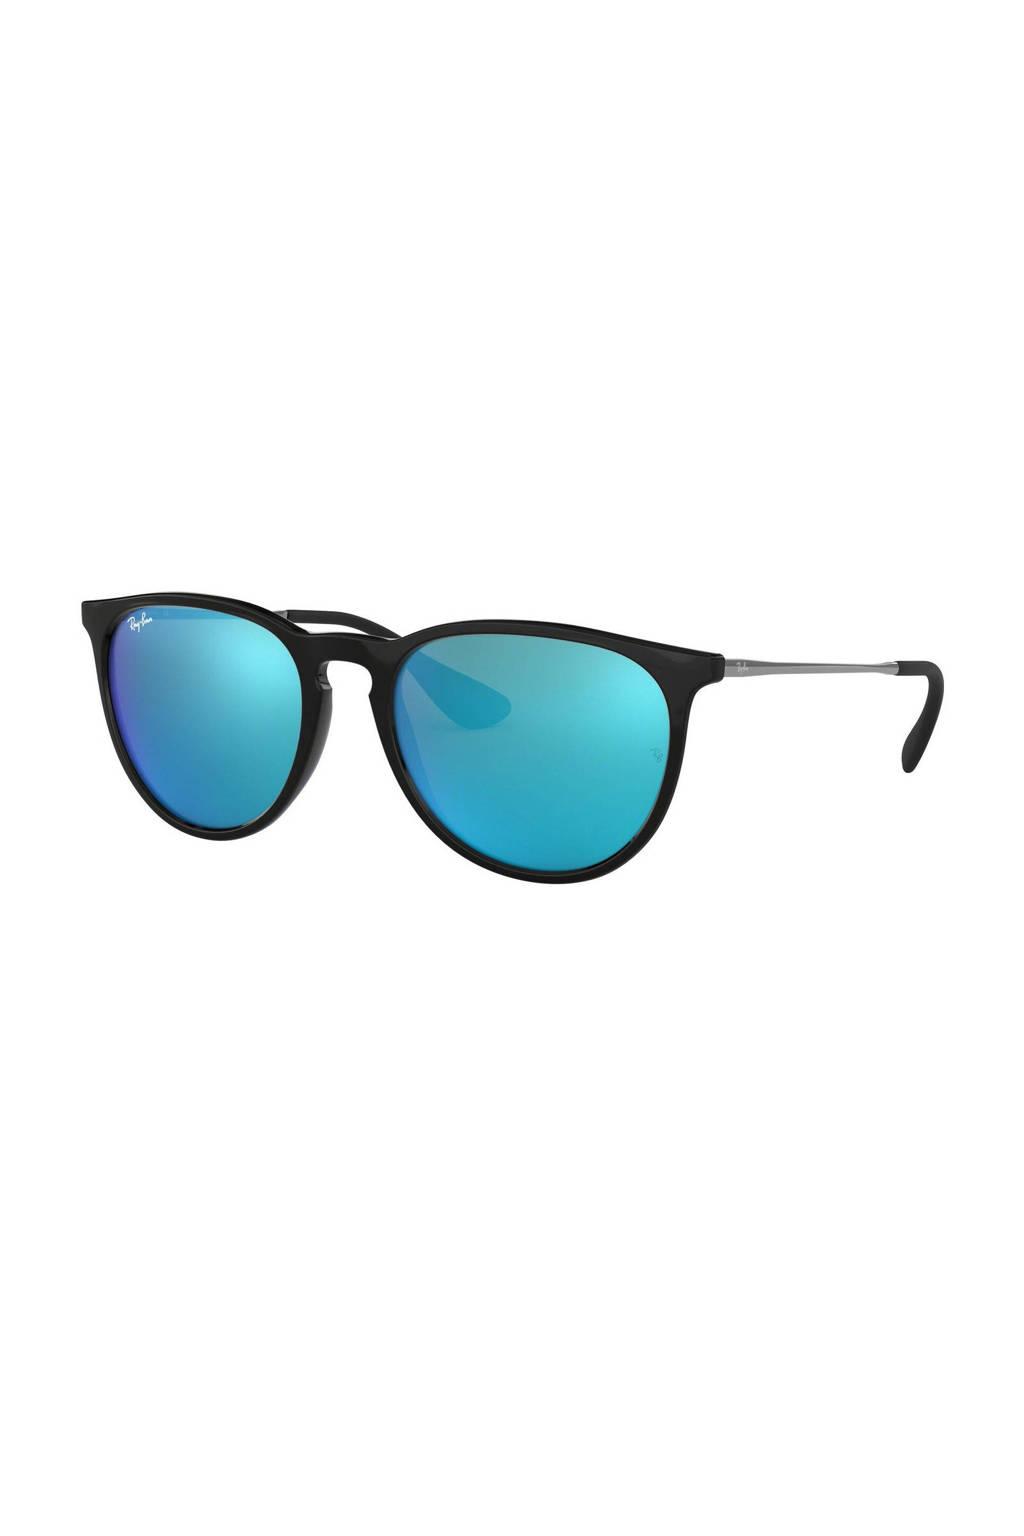 Ray-Ban zonnebril 0RB4171, Groen/blauw